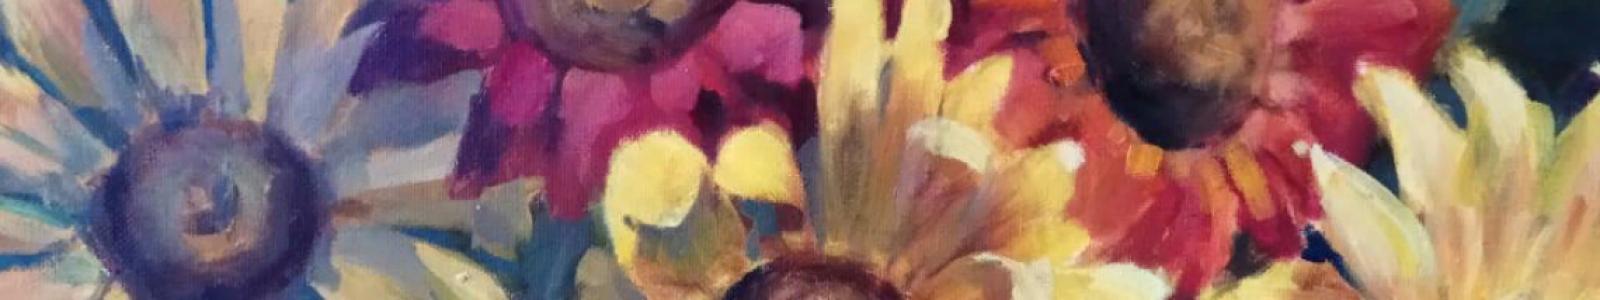 Gallery Painter Maria Tereshchenko